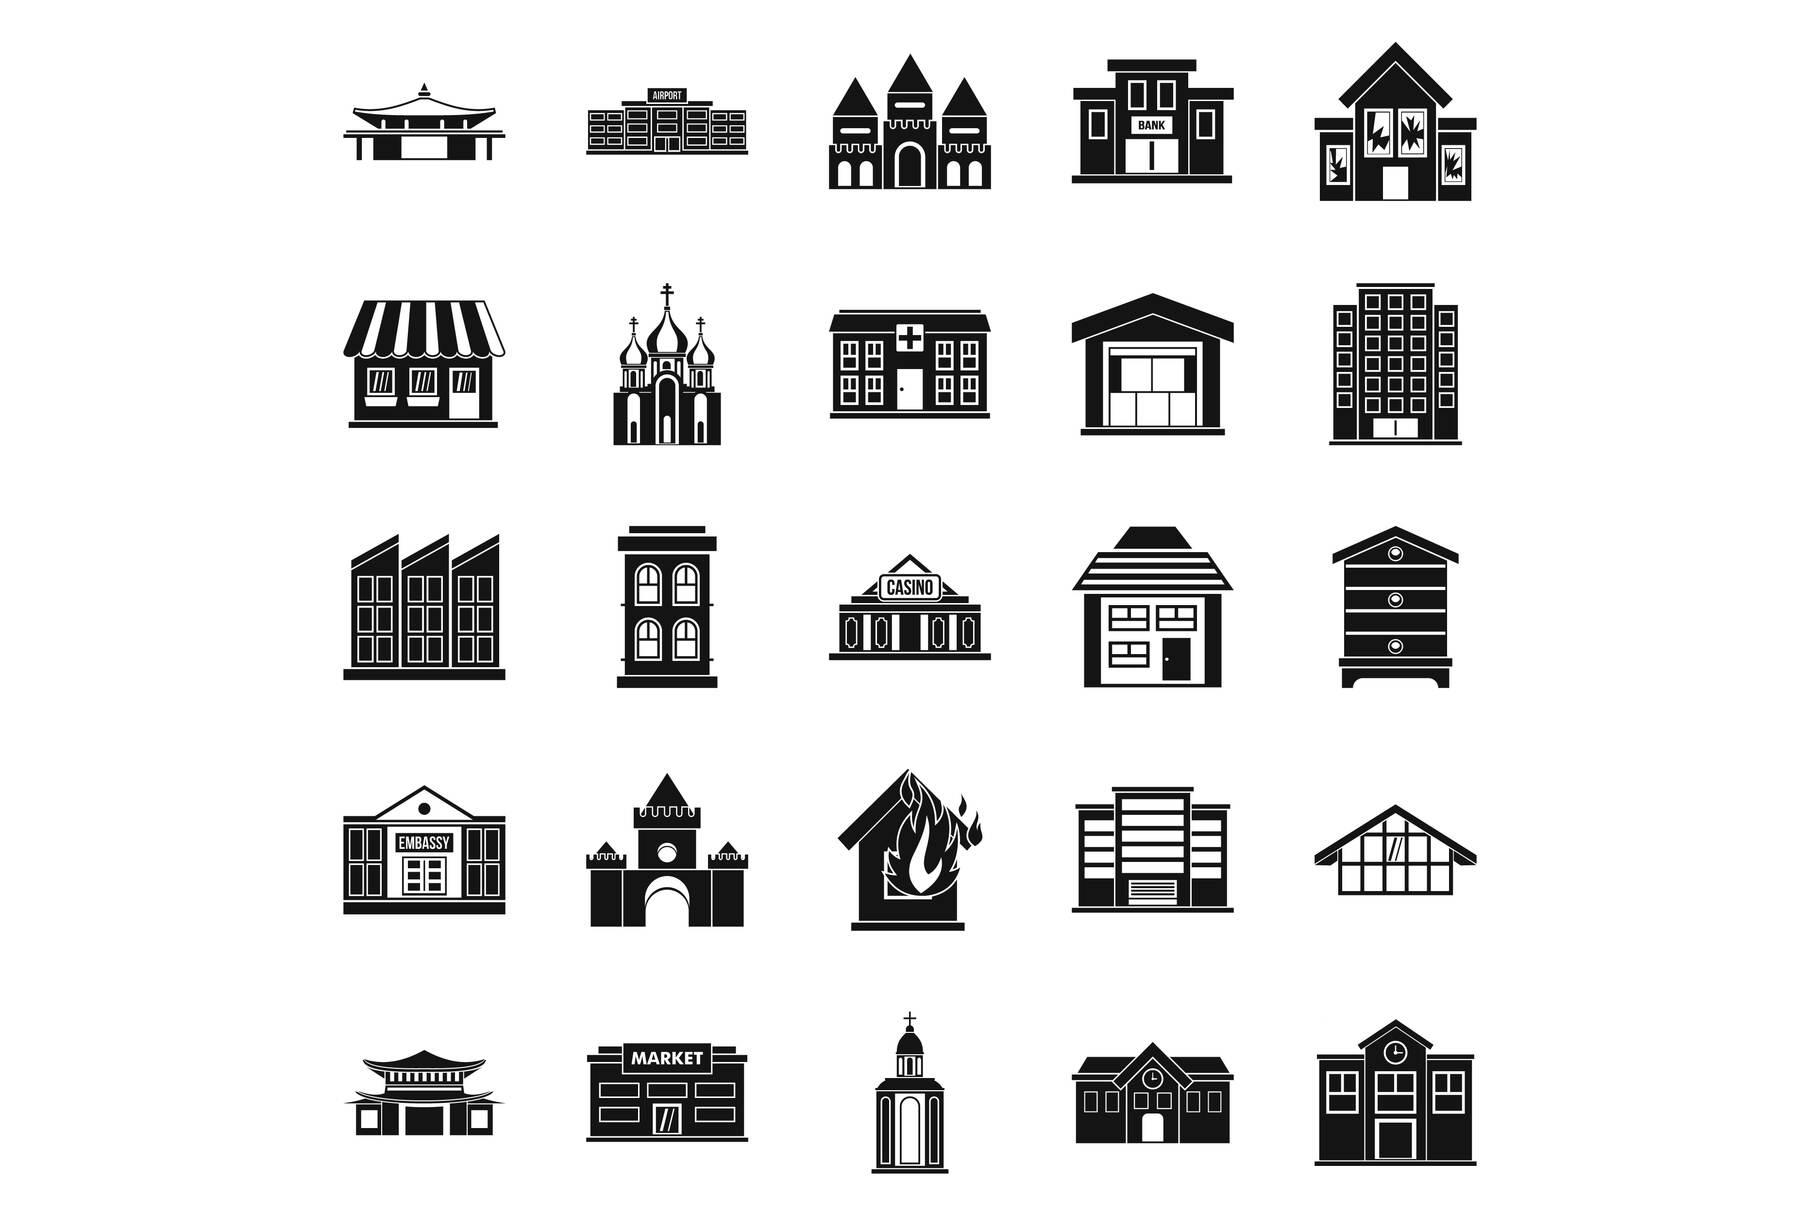 Land development icons set, simple style example image 1